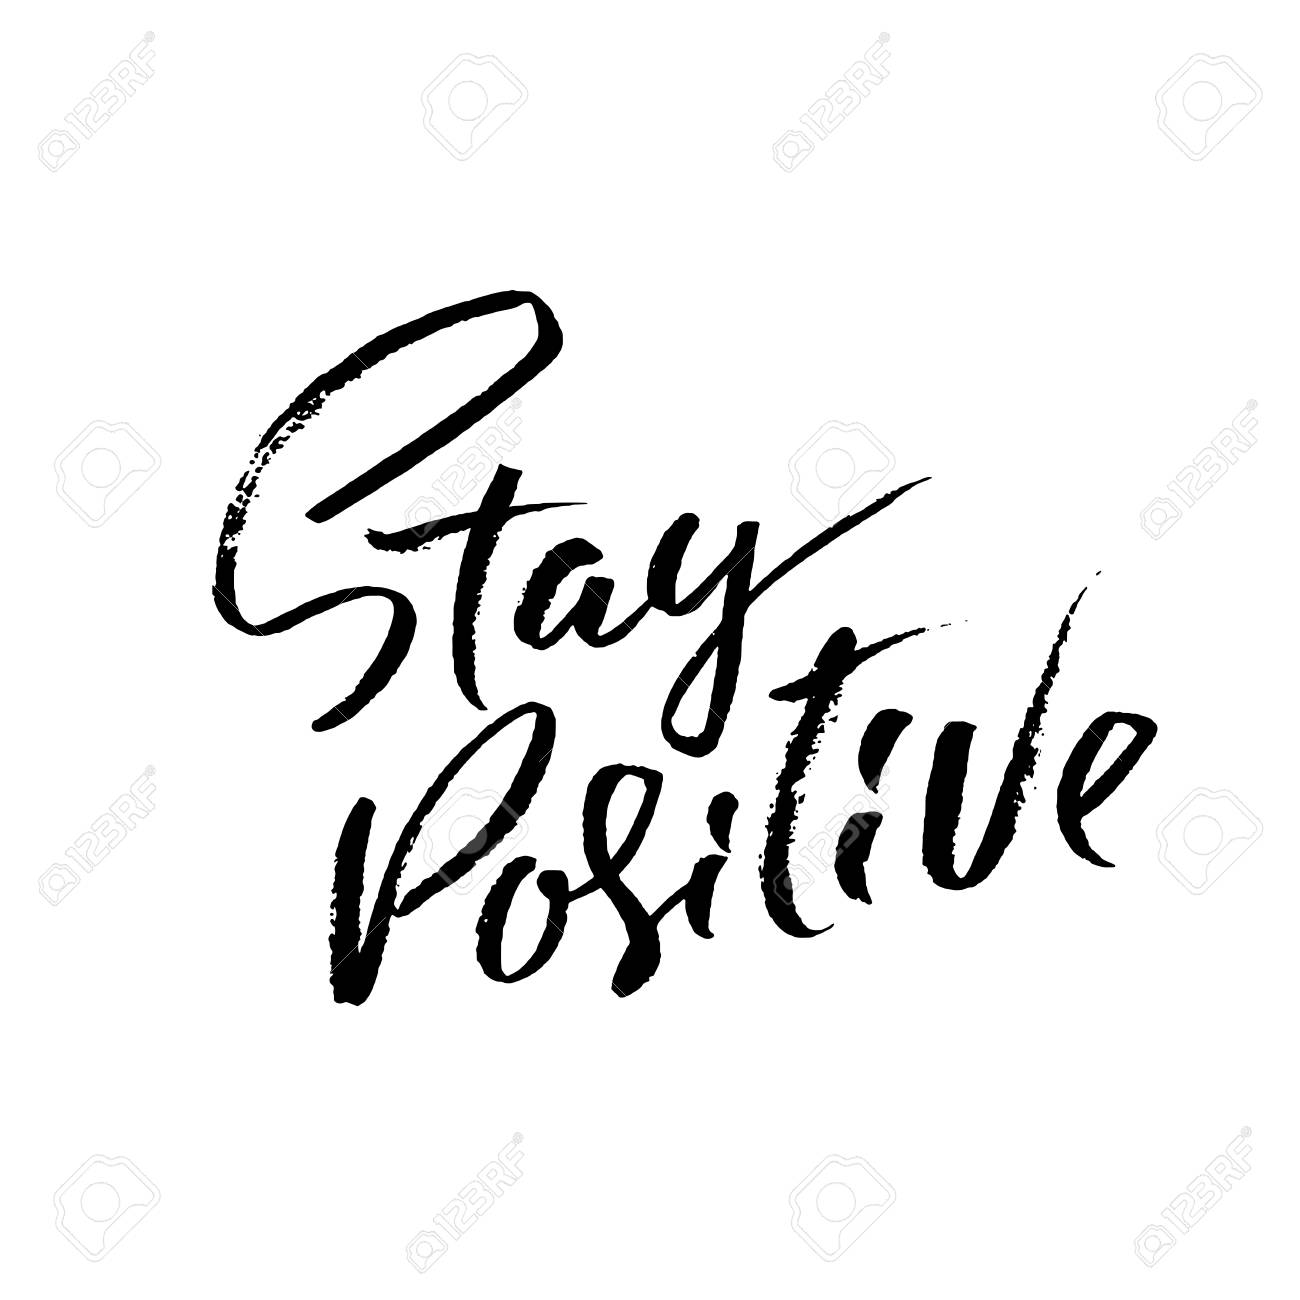 Stay Positive. Hand drawn dry brush motivational lettering. Ink illustration. Modern calligraphy phrase. Vector illustration - 95458634